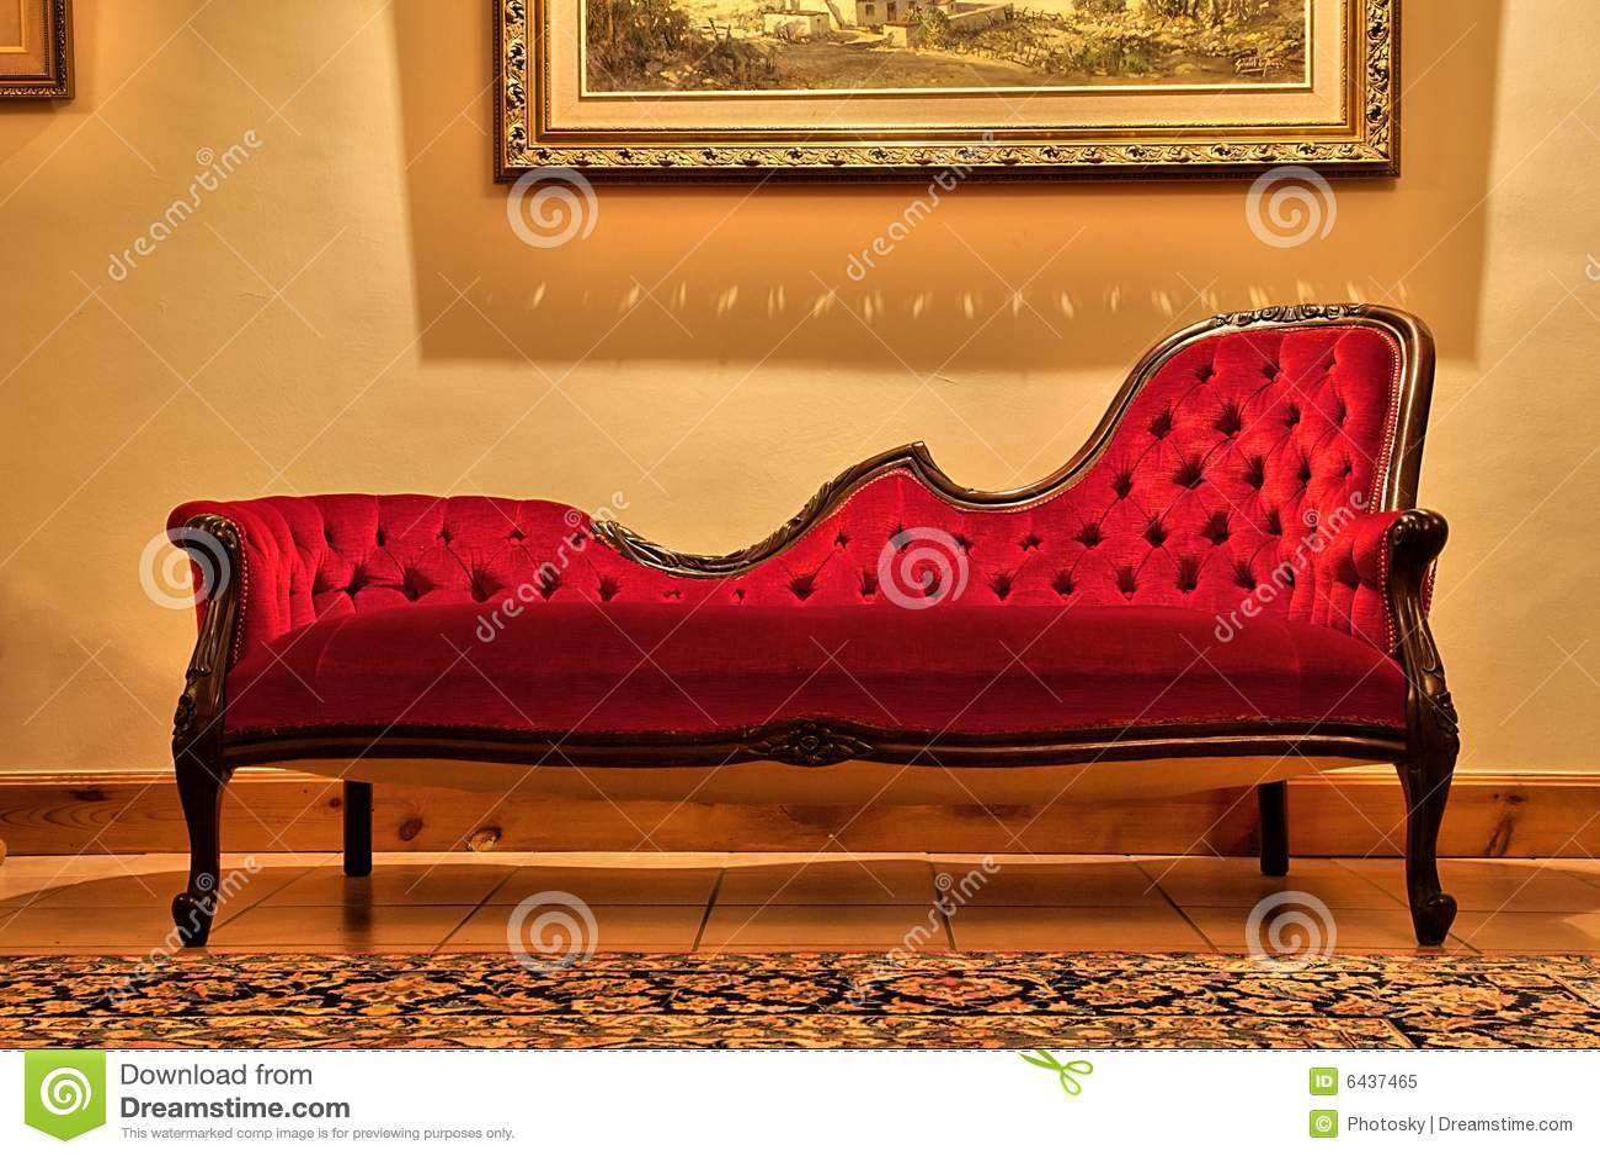 rotes sofa stockfotos – 1,884 rotes sofa stockbilder, Hause ideen